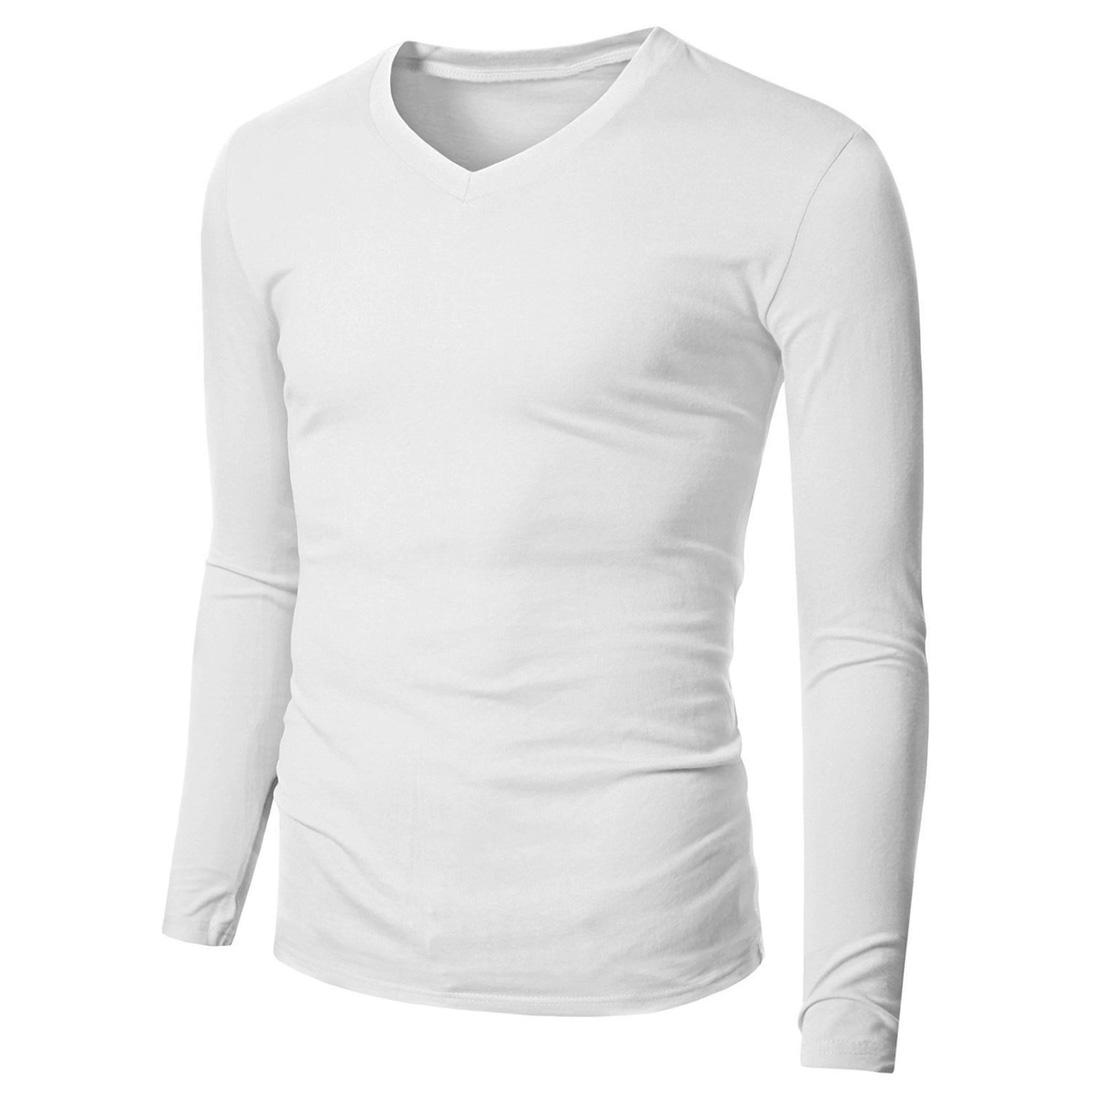 Mens cotton long sleeve t shirt v neck fitted plain casual for Mens plain v neck t shirts